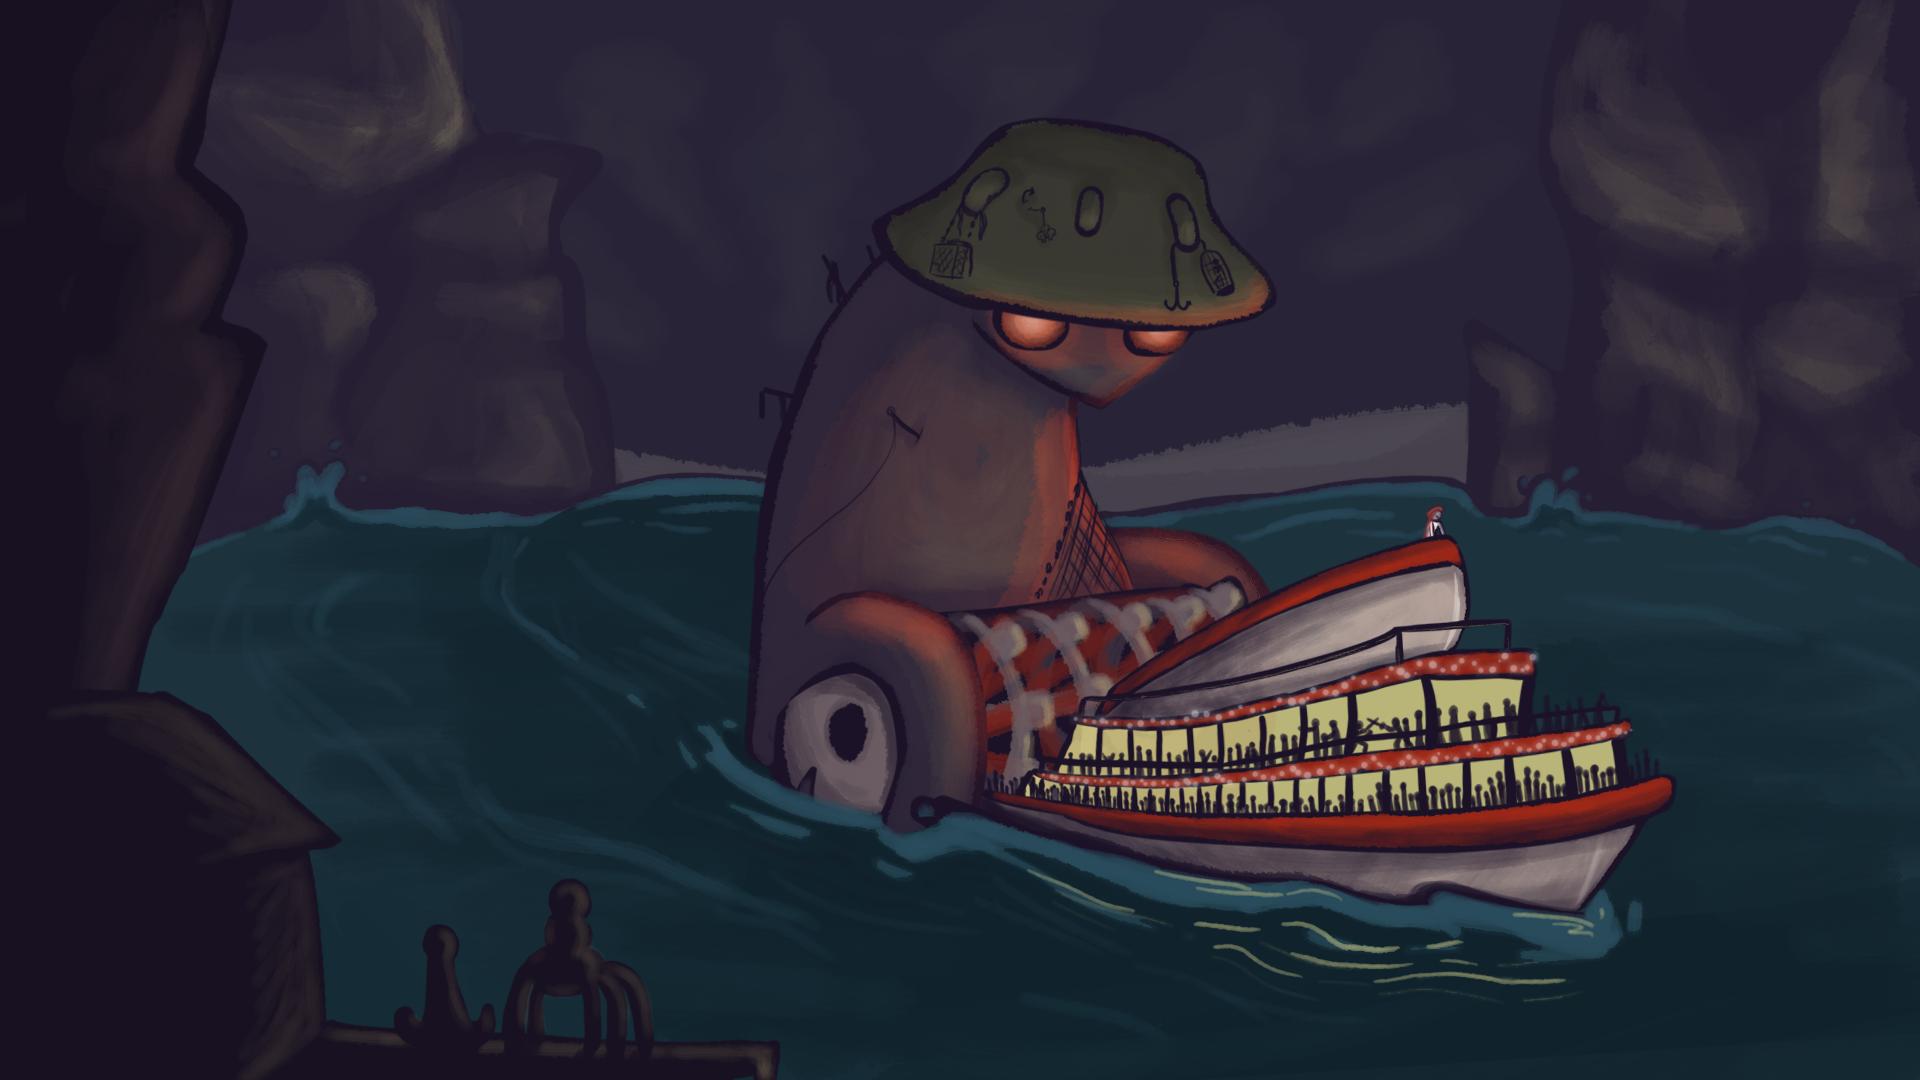 The Boatman's Ferry